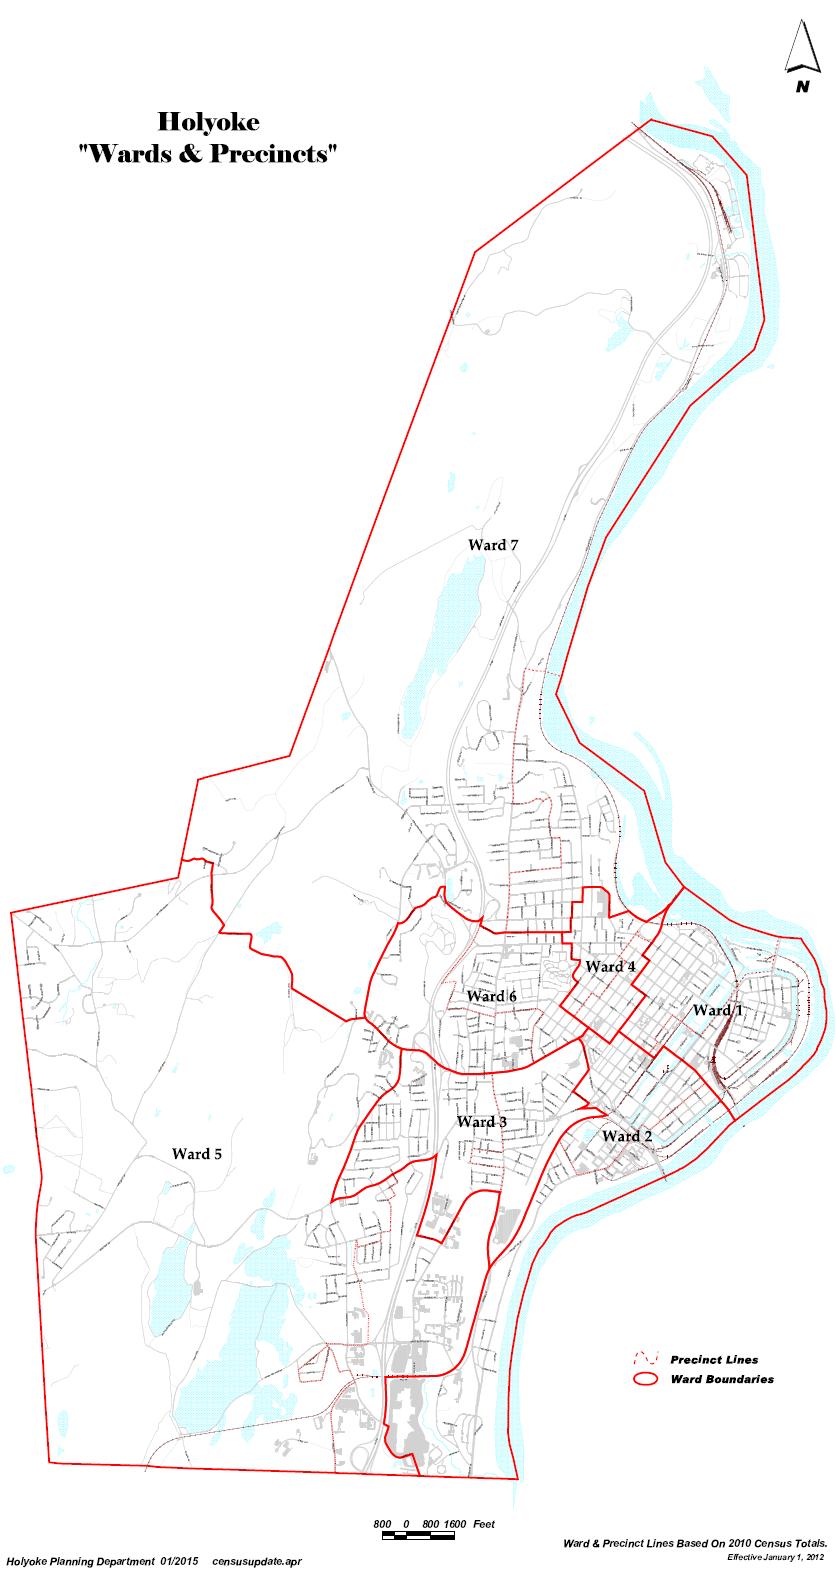 City Ward Maps